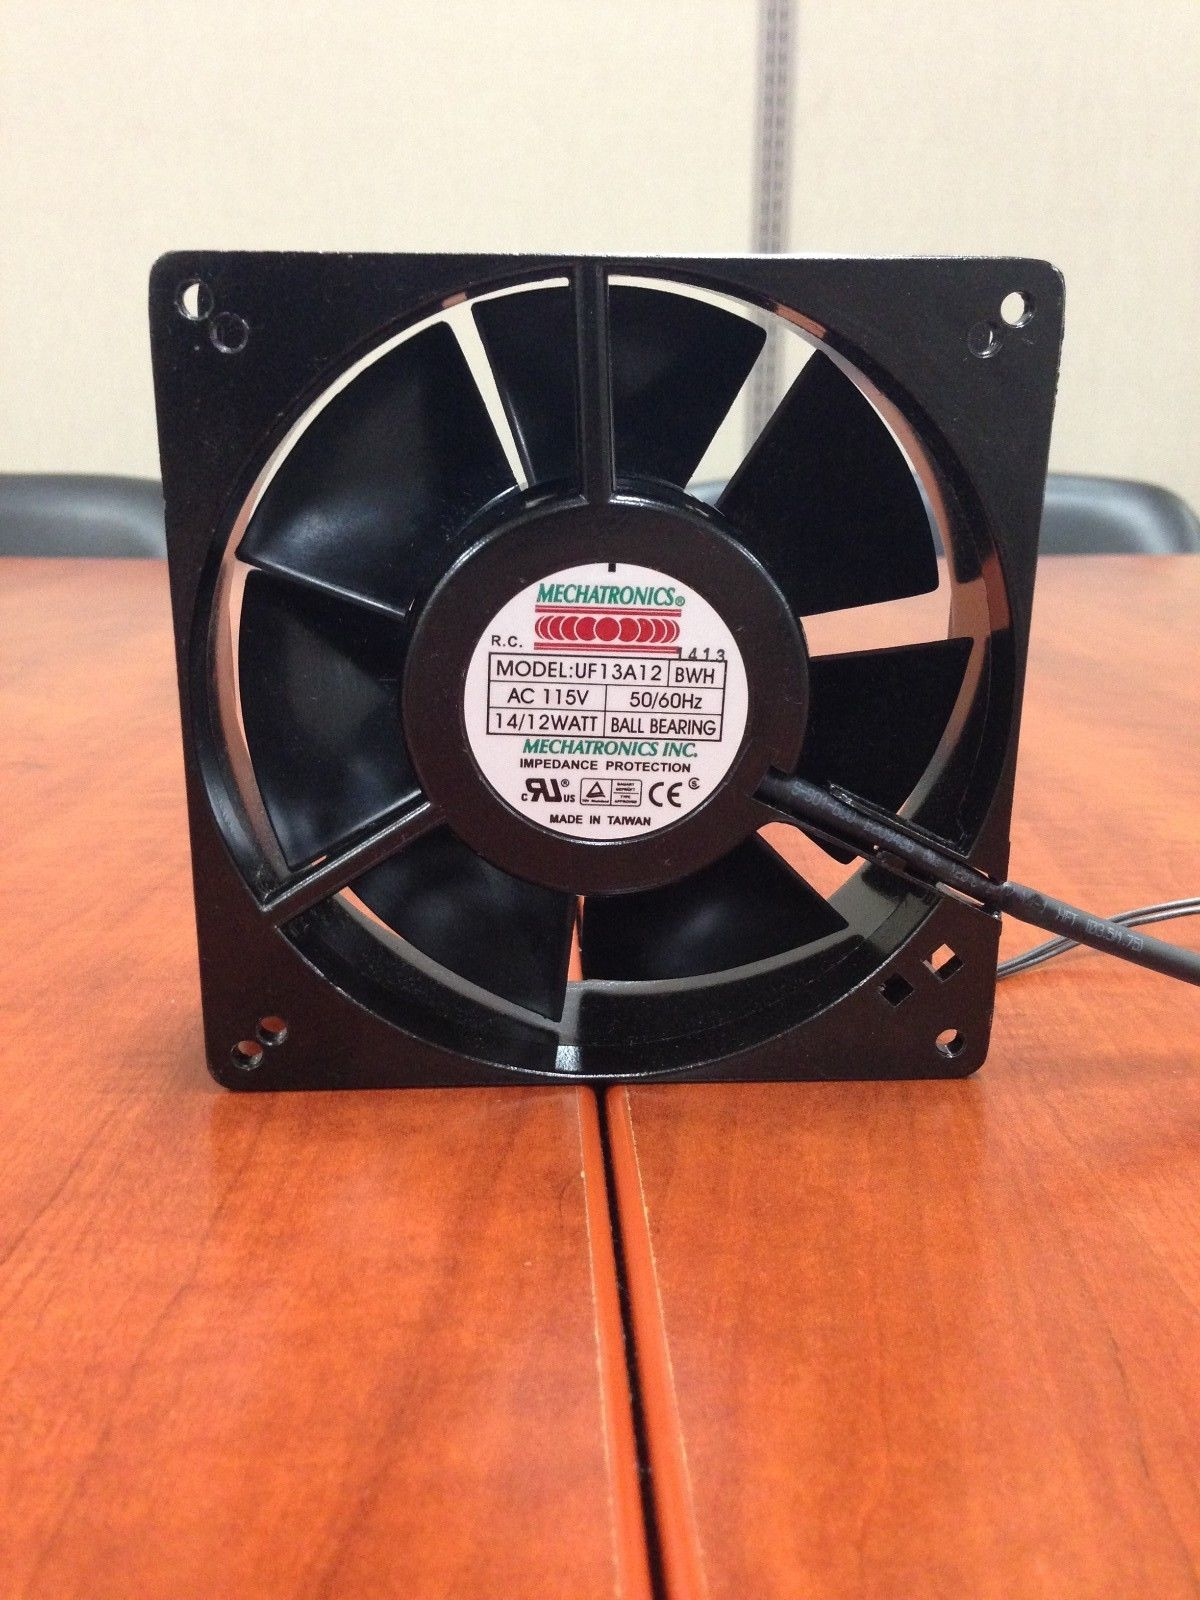 Axial fan 120 Cfm 5 x1.5 2 EA. FREE SHIPPING Fans & Blowers #B54116